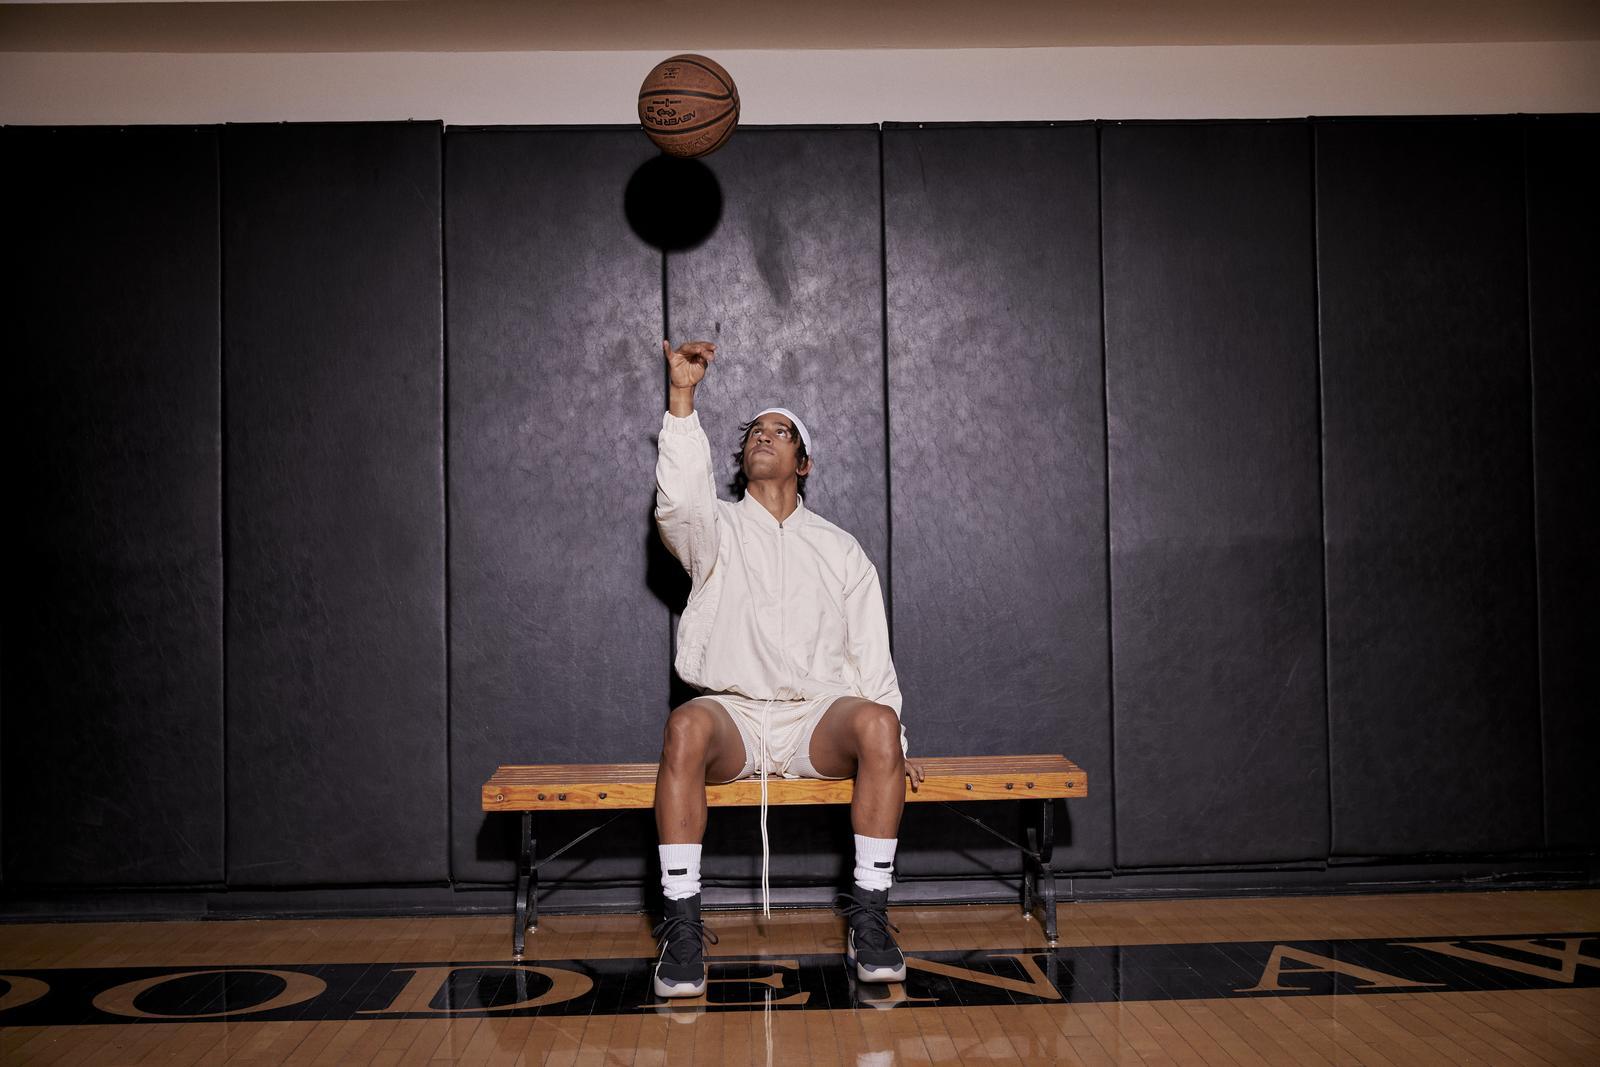 Nike、ジェリー・ロレンゾとのバスケットボールウェアコレクション発売